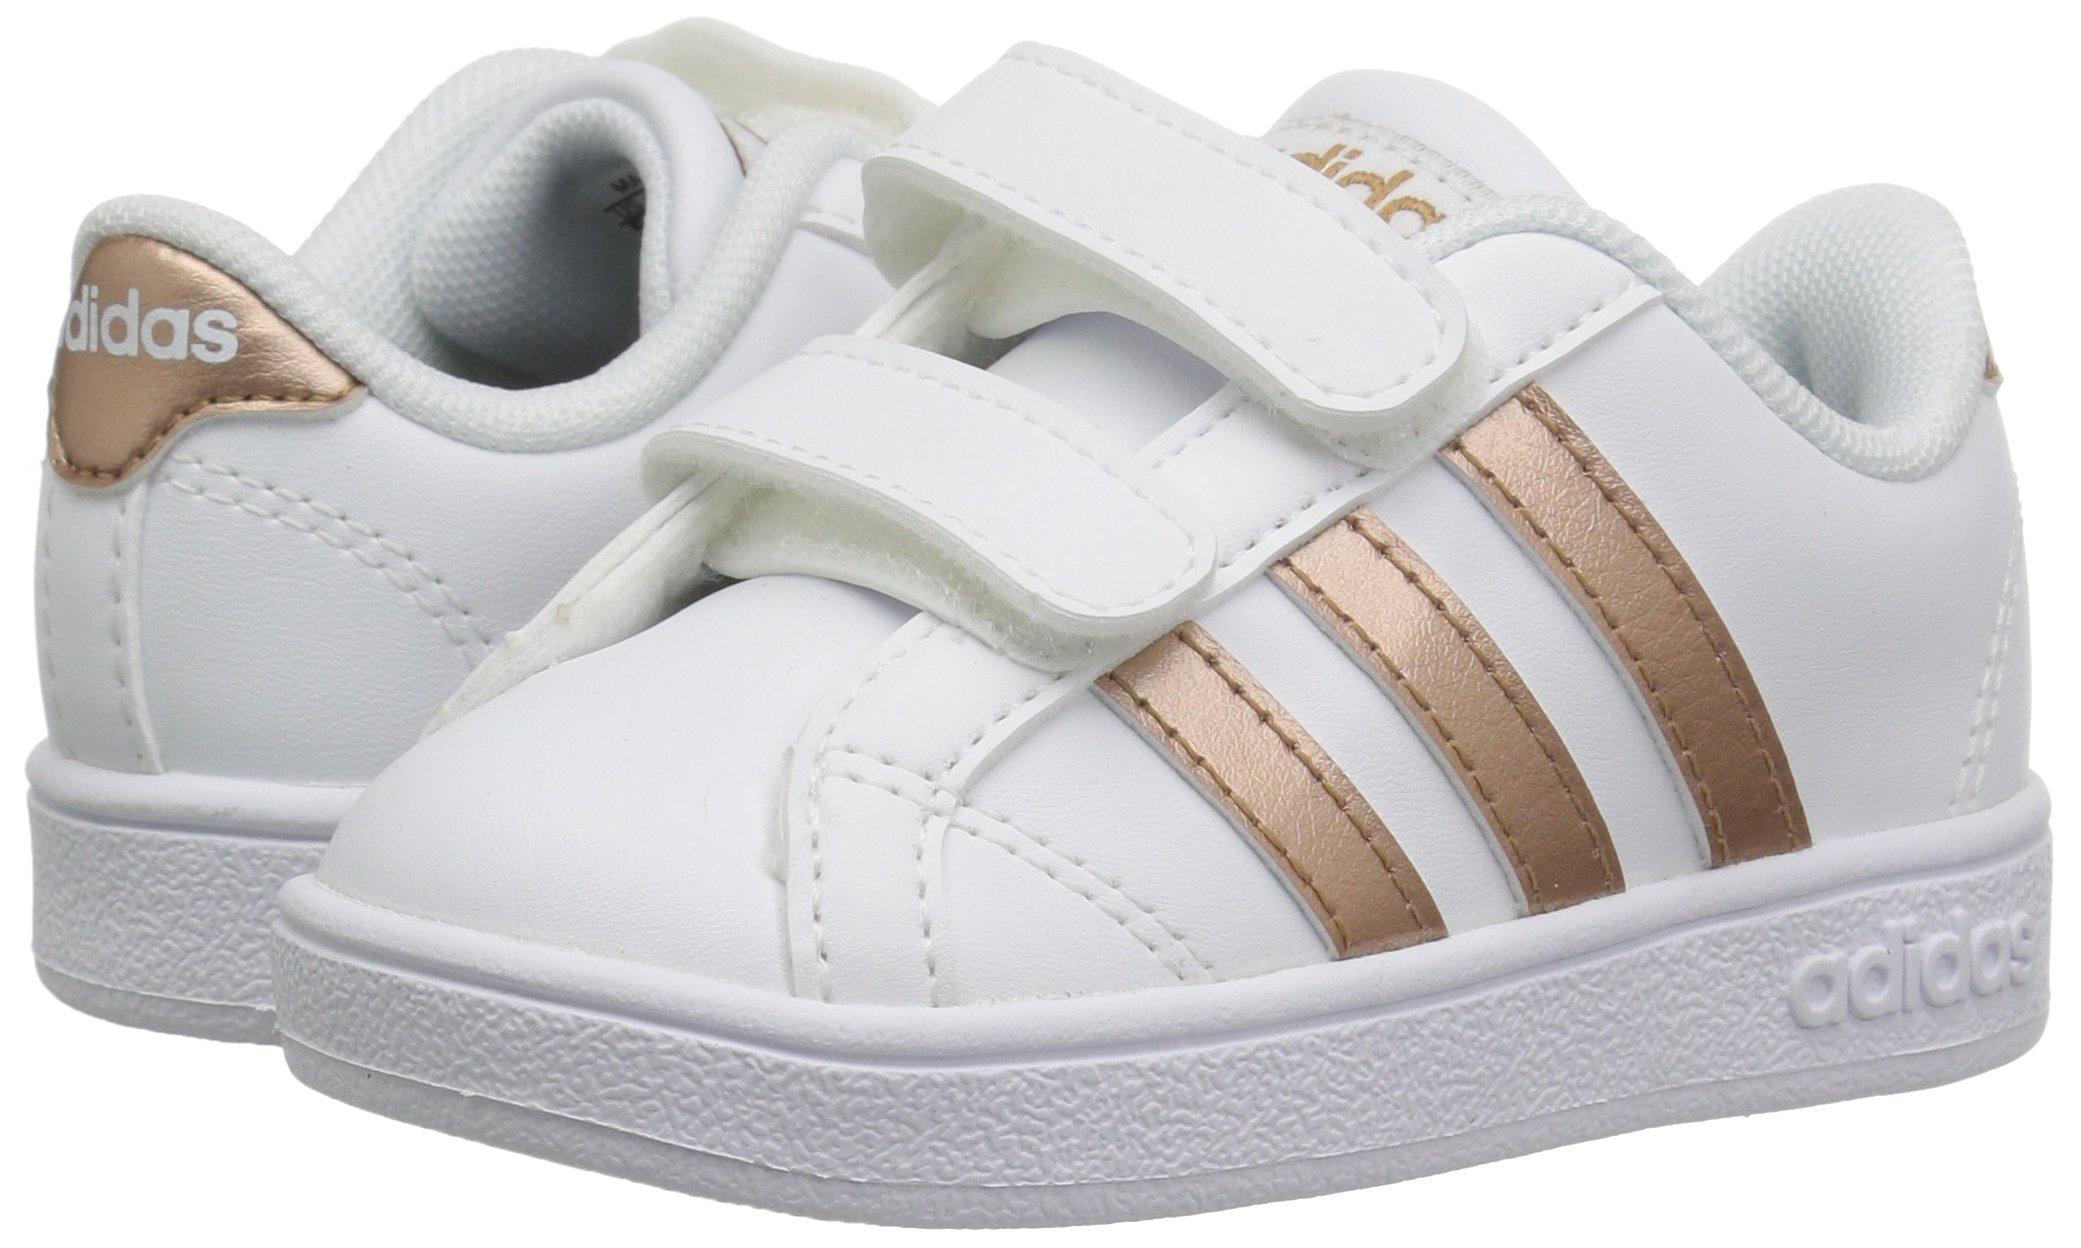 adidas Performance Baby Baseline, White/Copper Metallic/Black, 6K M US Toddler by adidas (Image #5)